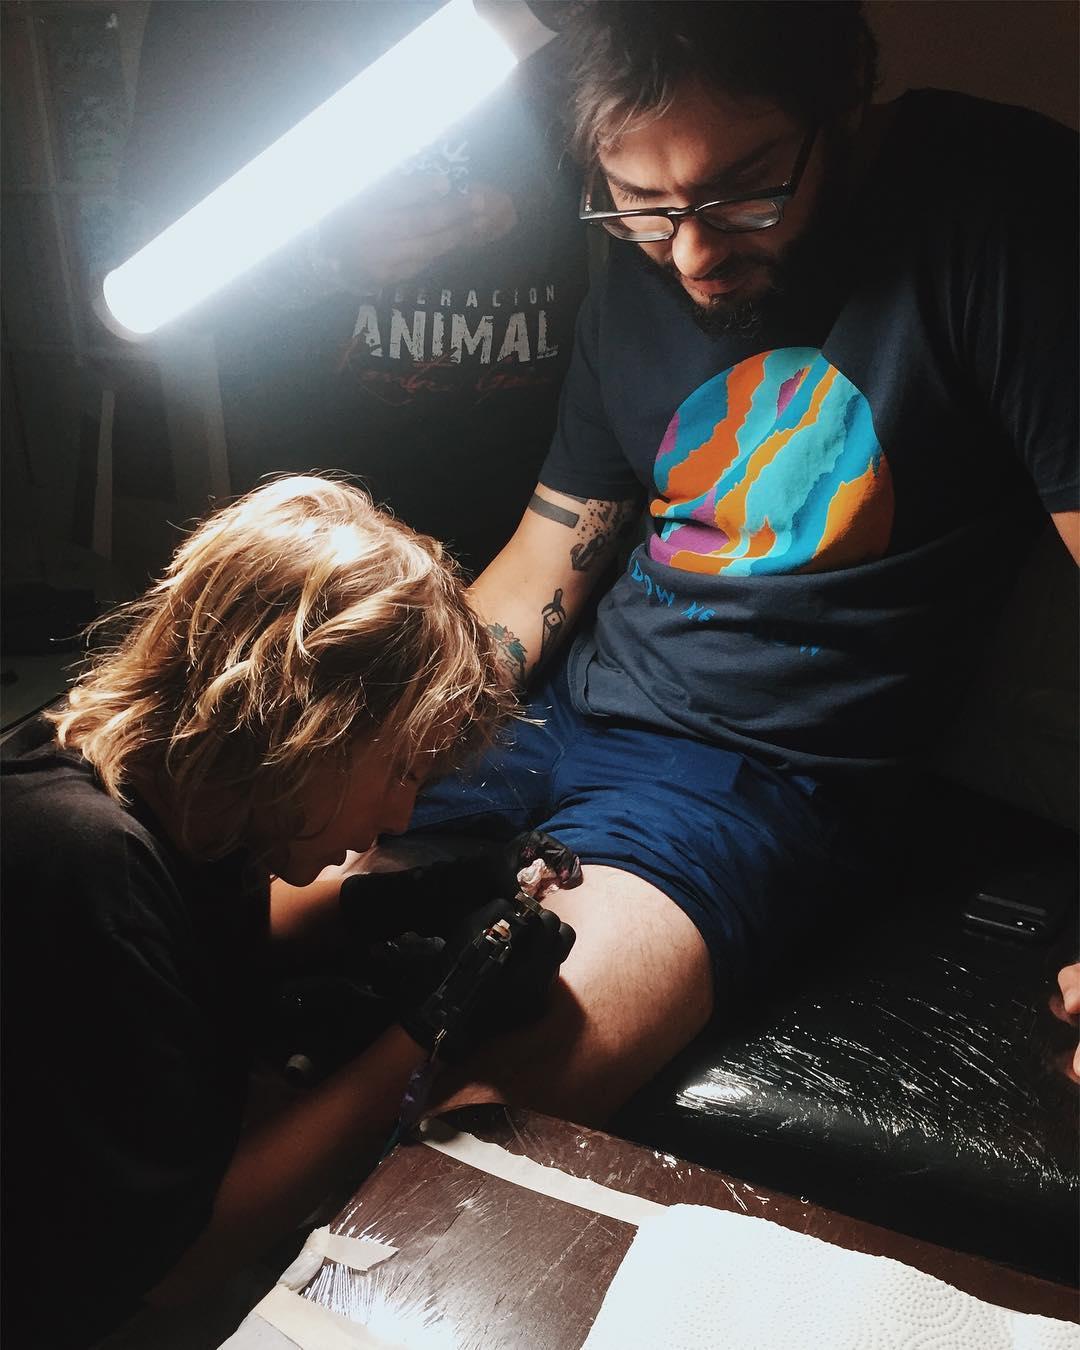 Эзра Дормон, Ezrah Dormon, подросток, татуировщик, Акула, Shark